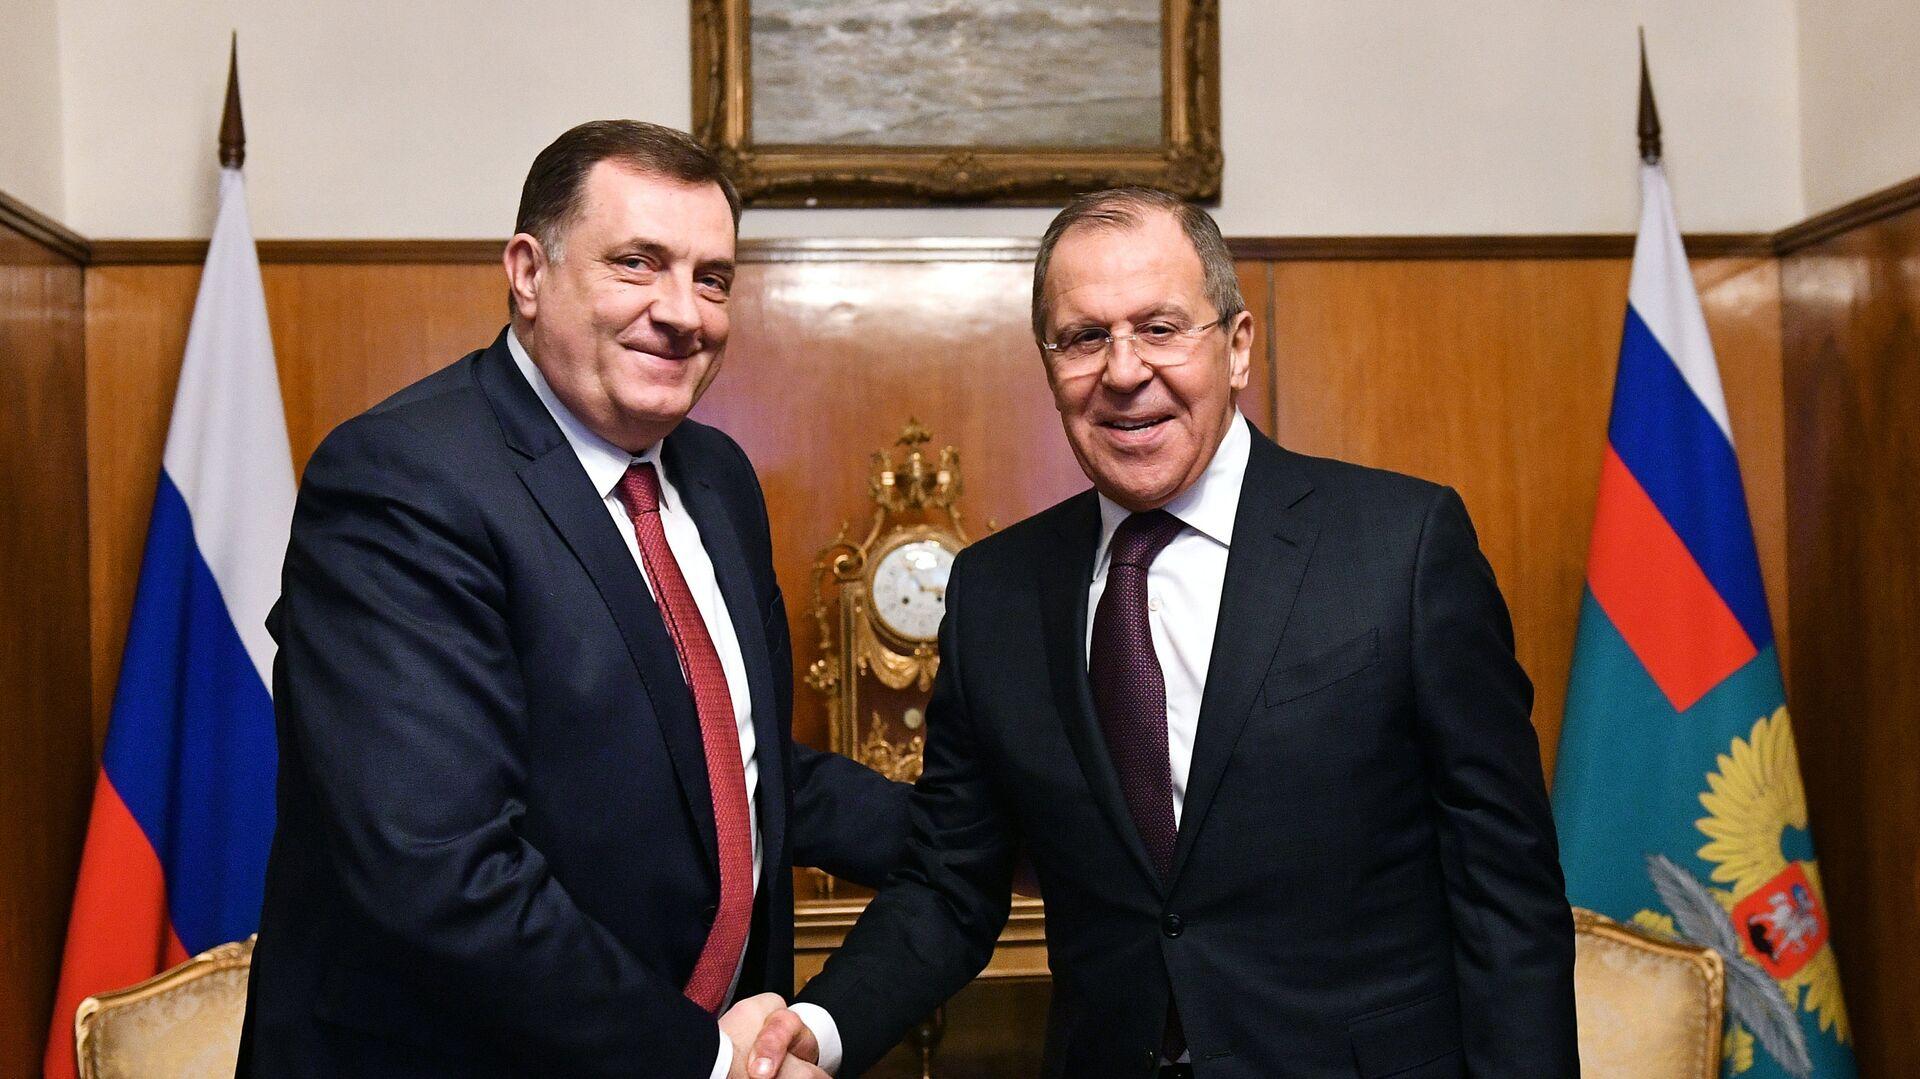 Predsednik Republike Srpske Milorad Dodik i ministar spoljnih poslova Rusije Sergej Lavrov - Sputnik Srbija, 1920, 10.10.2021